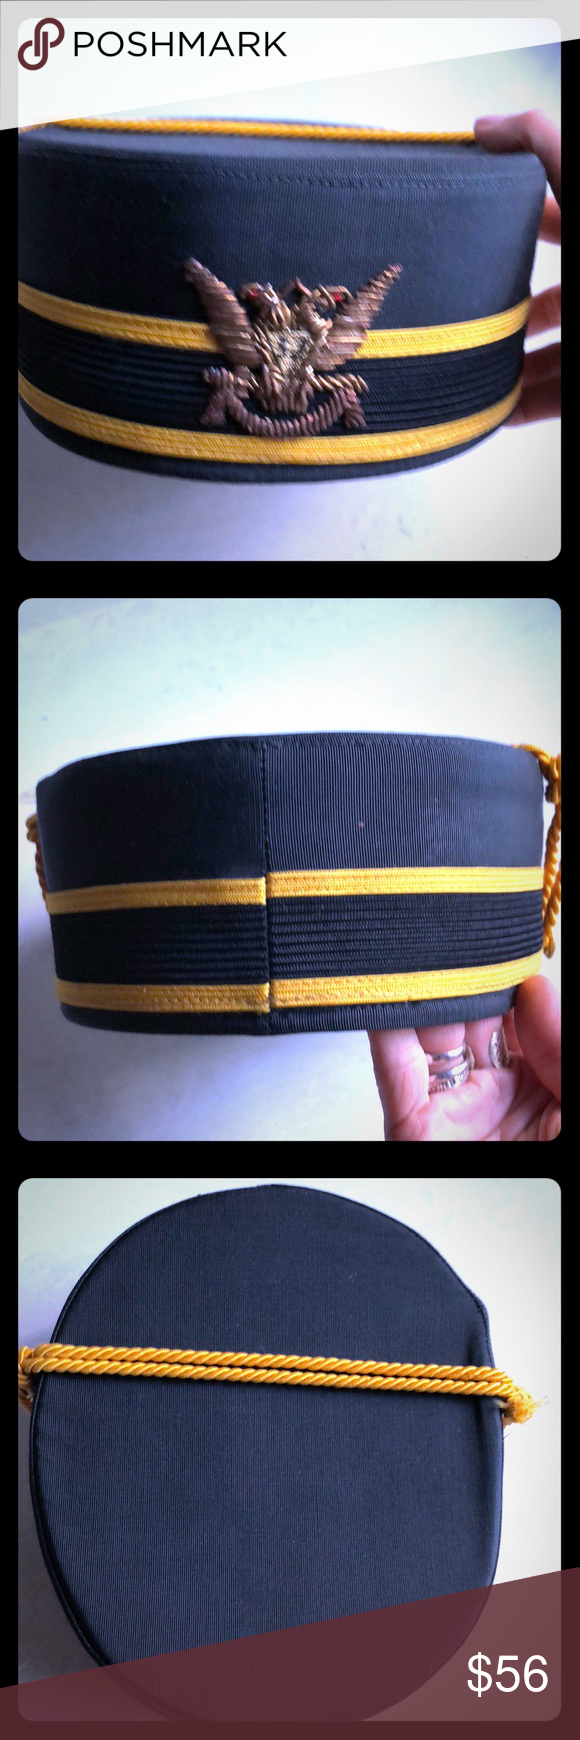 Robinson Jewelers Bellhop hat Vintage Sz 7 New Hats vintage